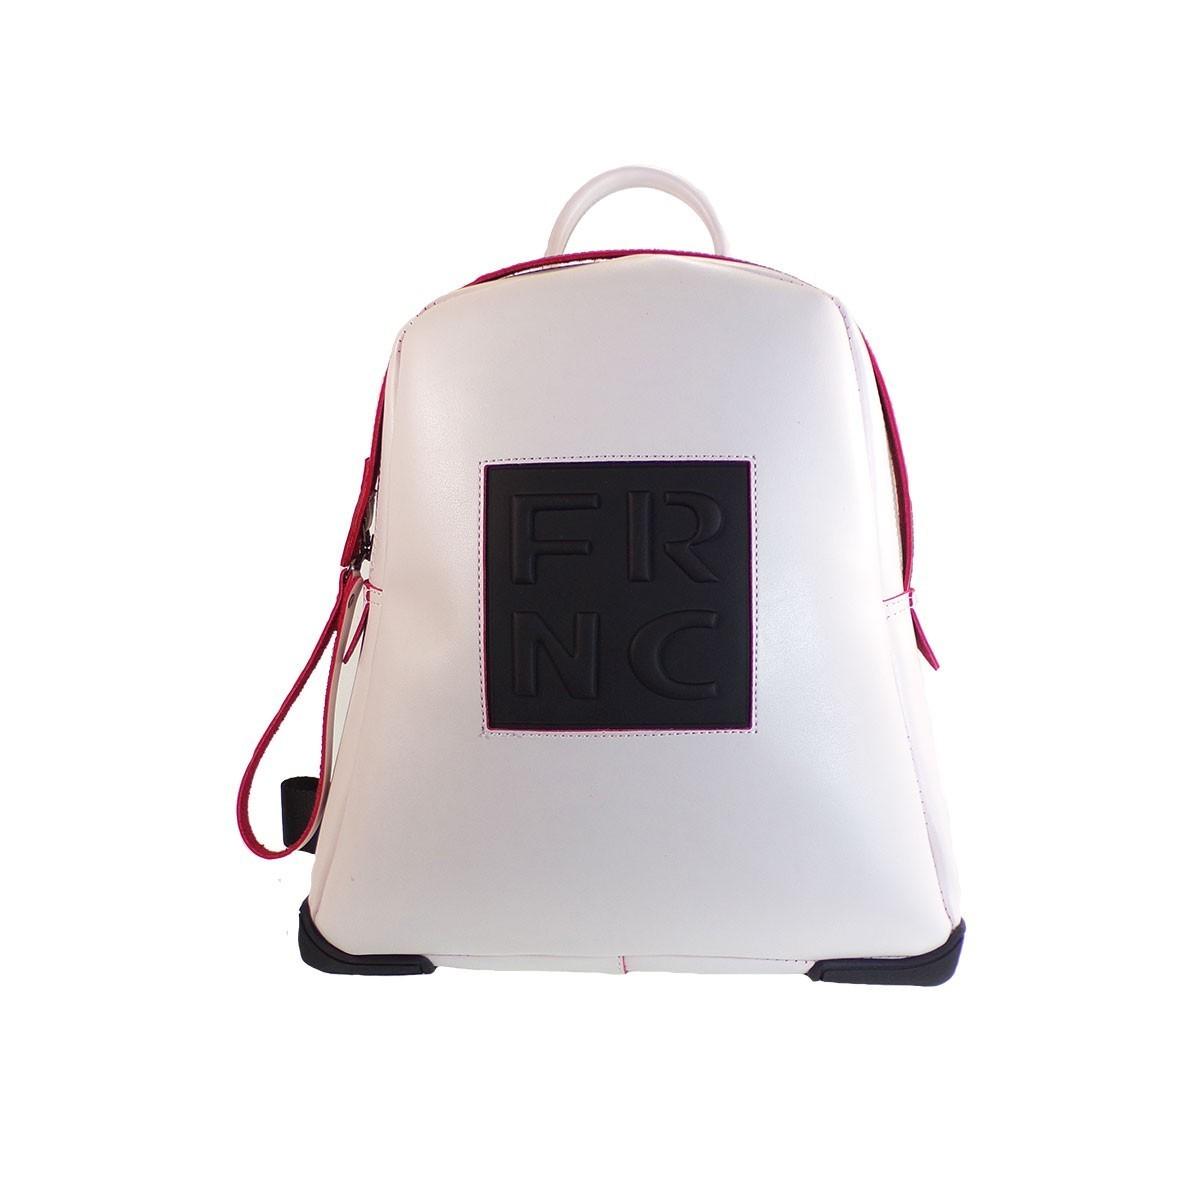 a4f26e4850 FRNC FRANCESCO Τσάντα Γυναικεία Πλάτης-Backpack 2023 Off White Δέρμα ...